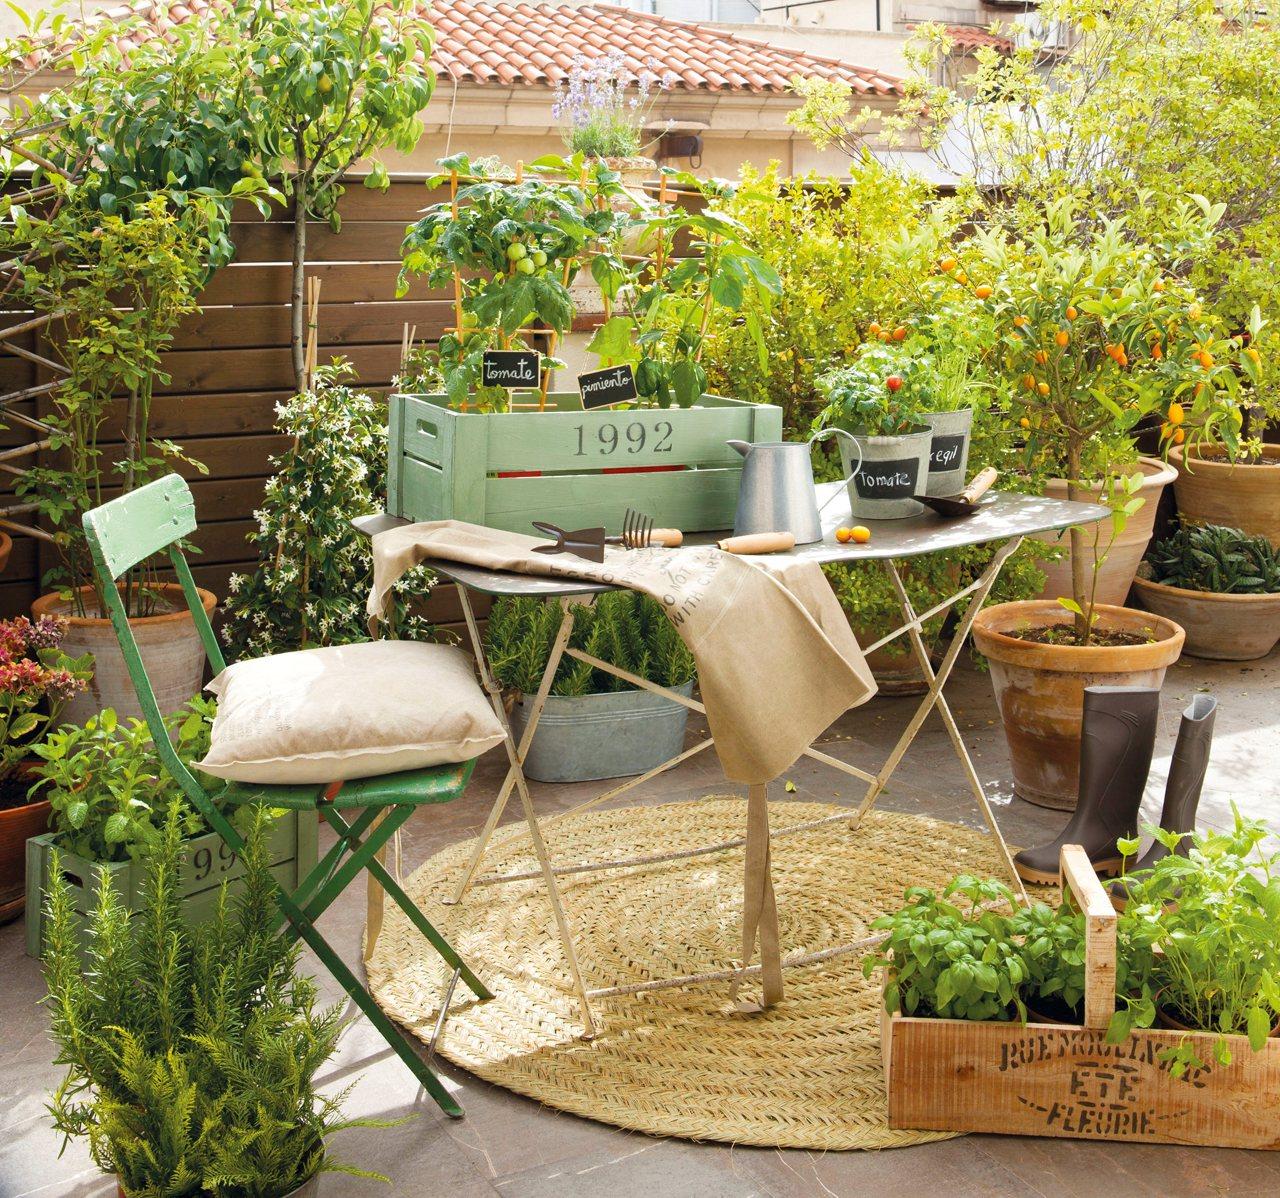 15 formas de aprovechar exteriores peque os - Huerto en la terraza ...